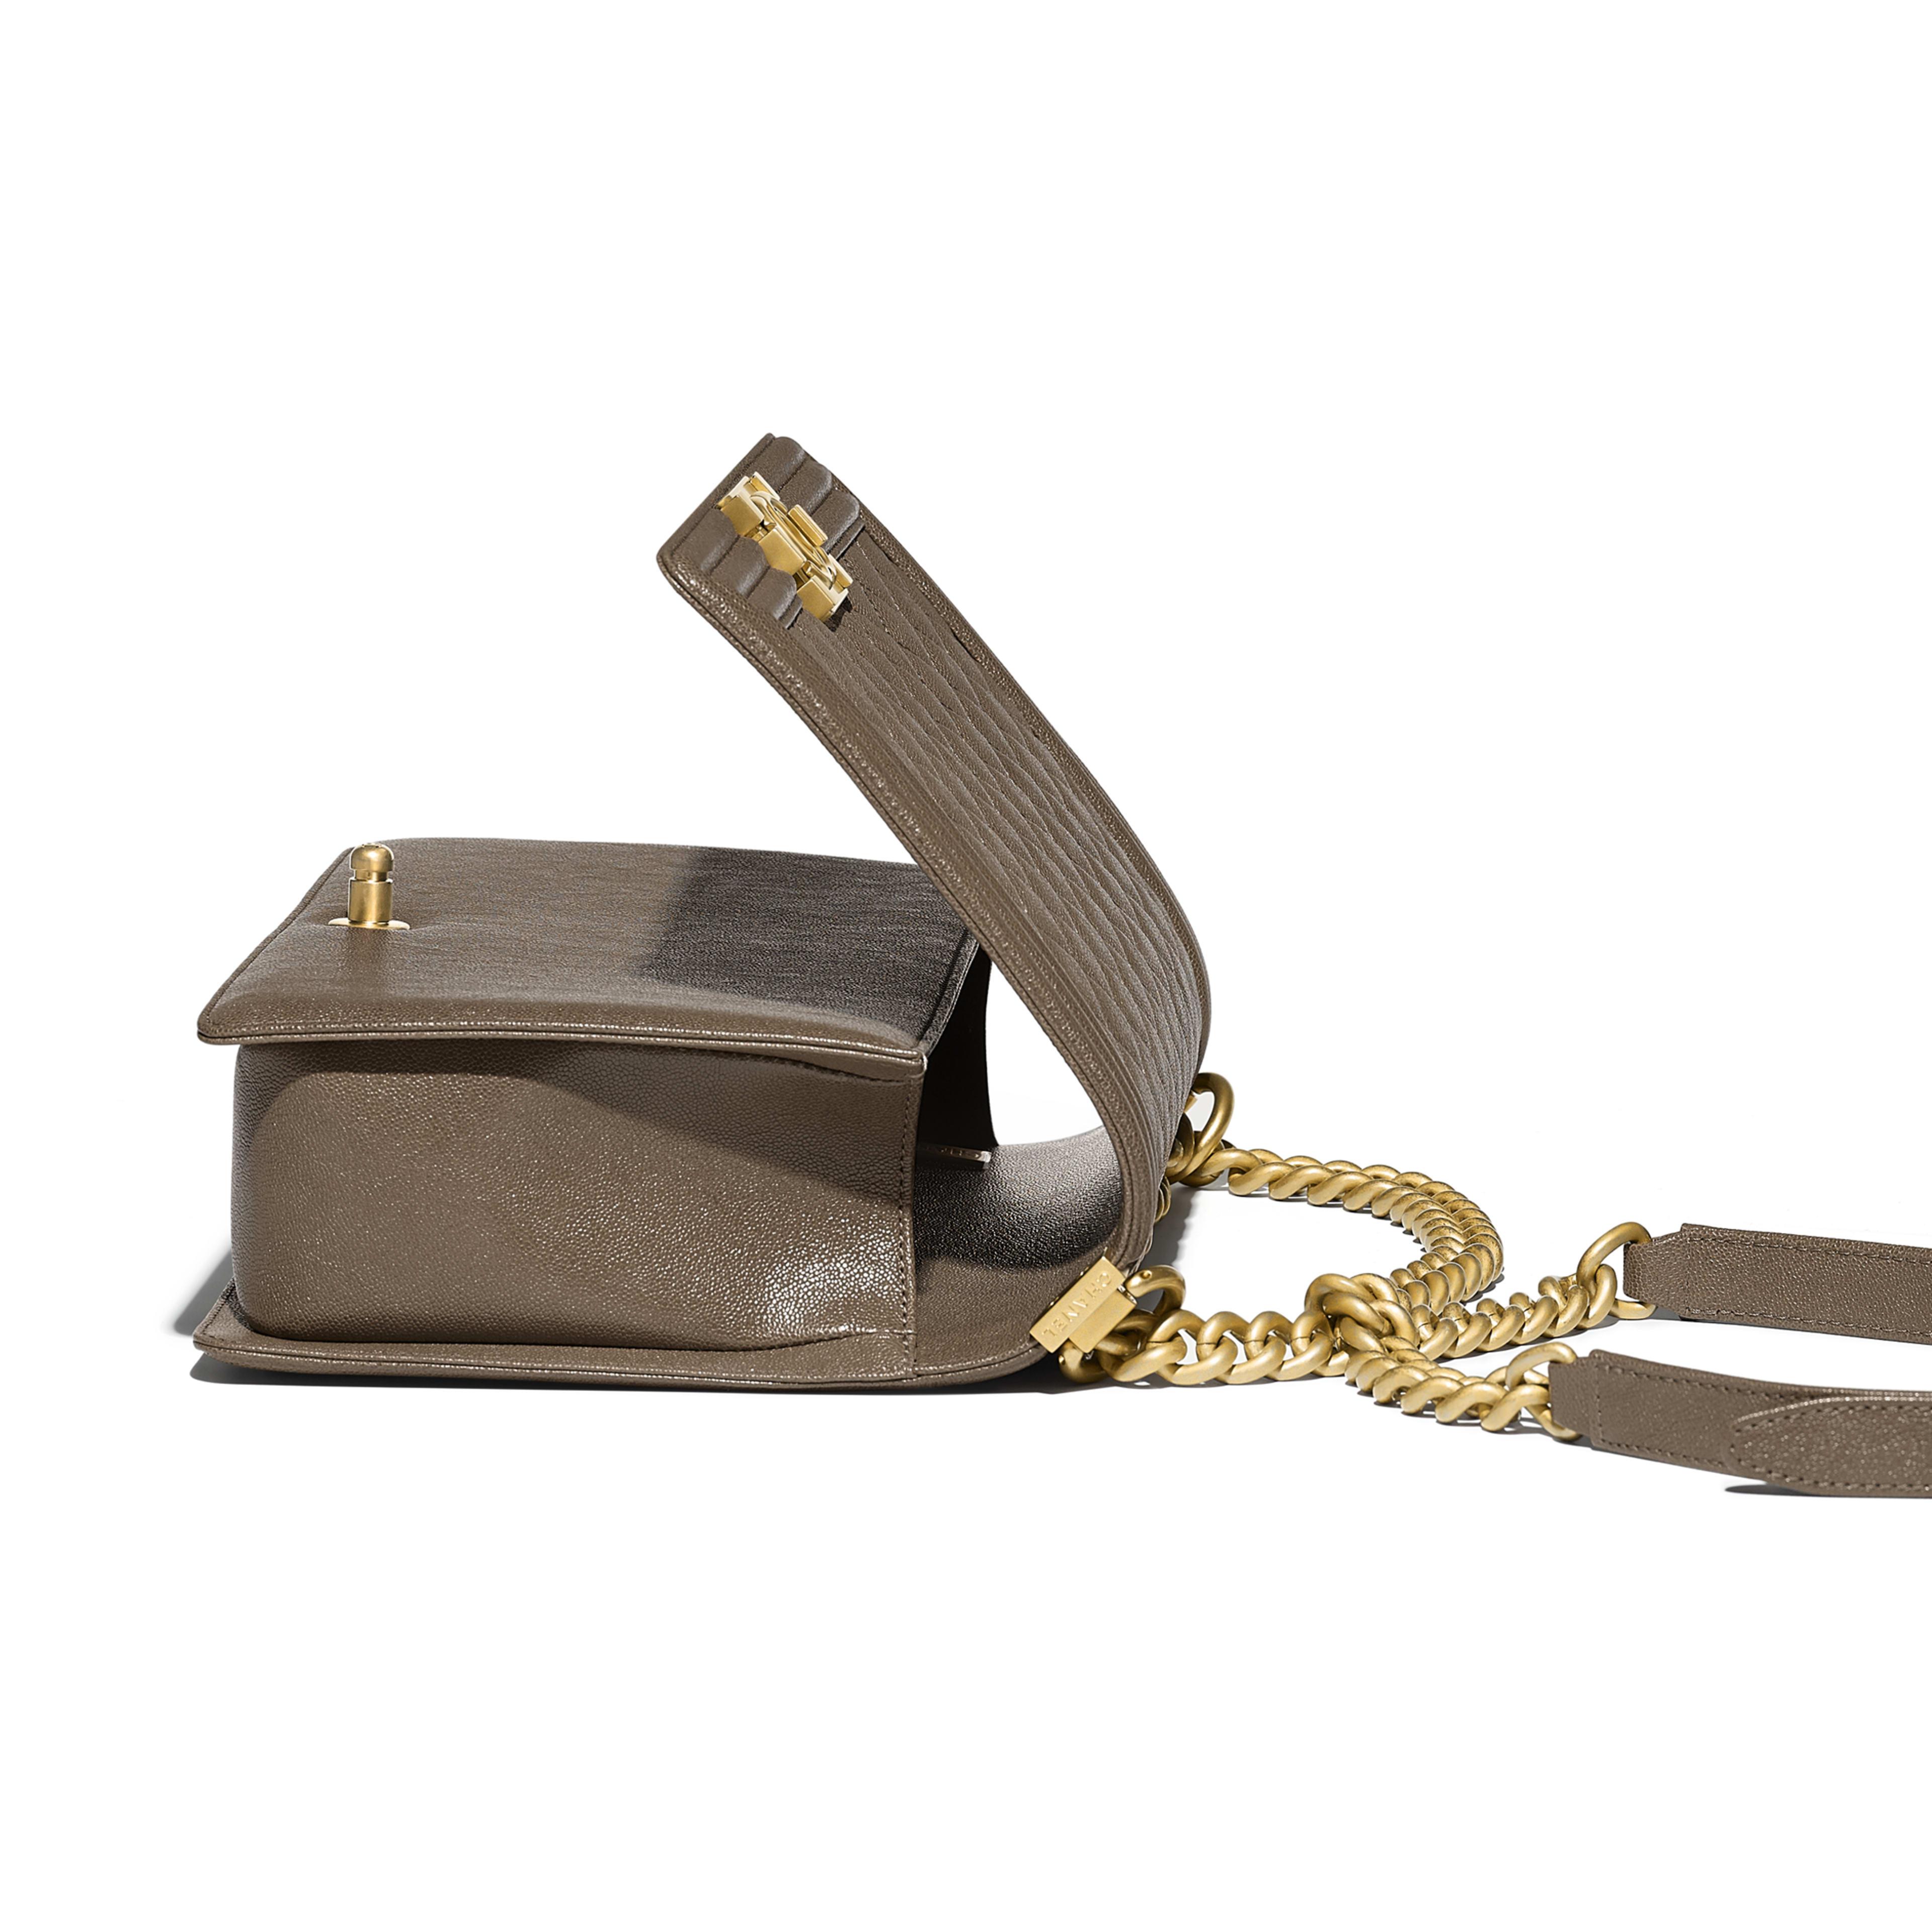 Large BOY CHANEL Handbag Grained Calfskin & Gold-Tone Metal Khaki -                                            view 3 - see full sized version